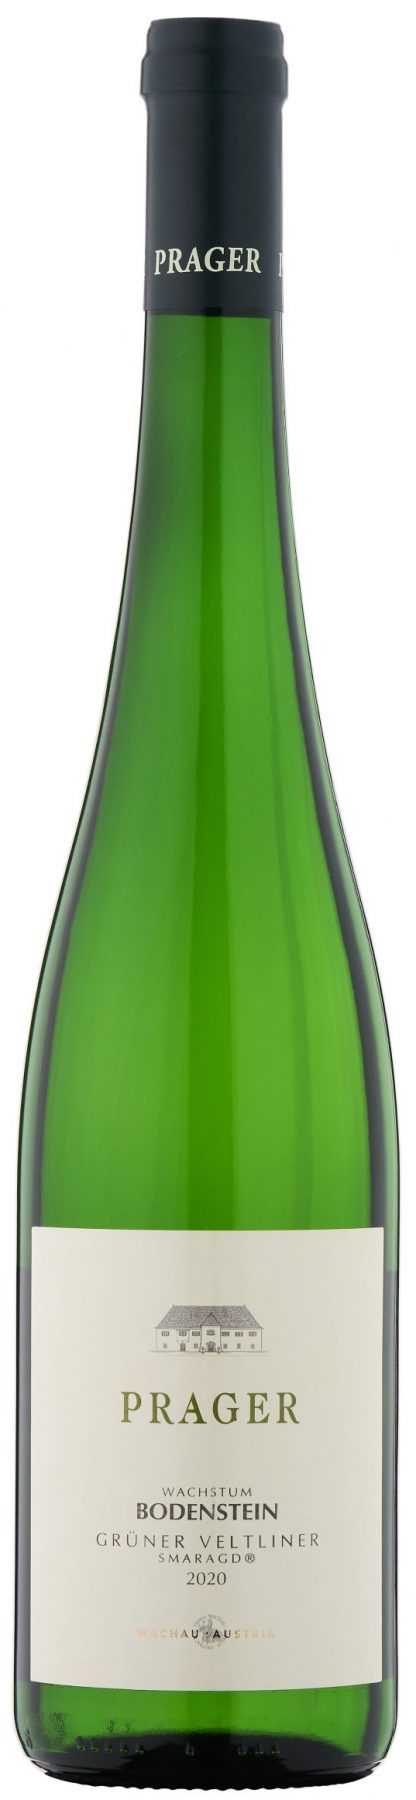 Prager - Grüner Veltliner Smaragd Wachstum Bodenstein 2020